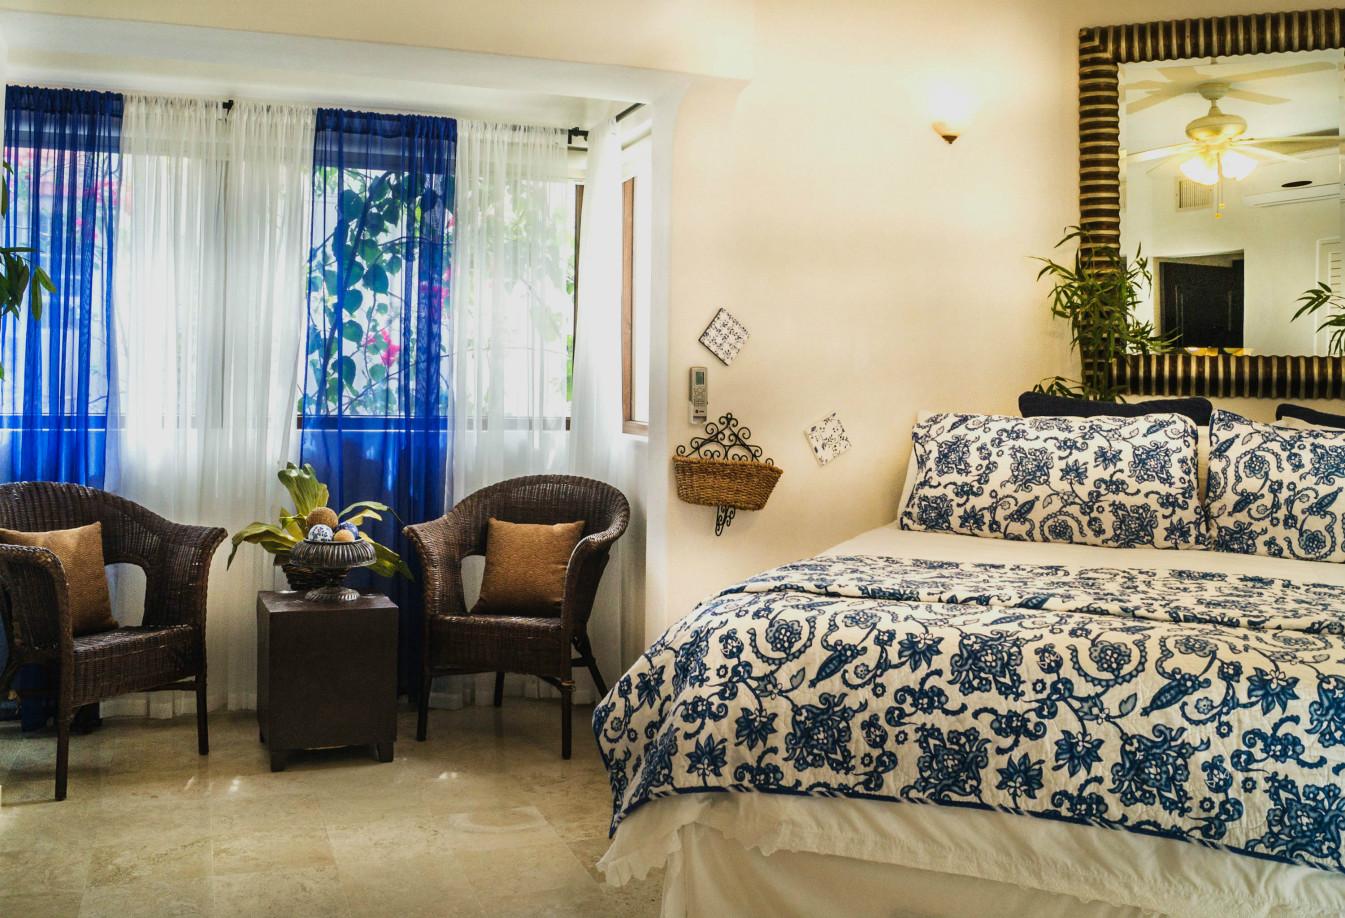 Royal Palms condo rentals